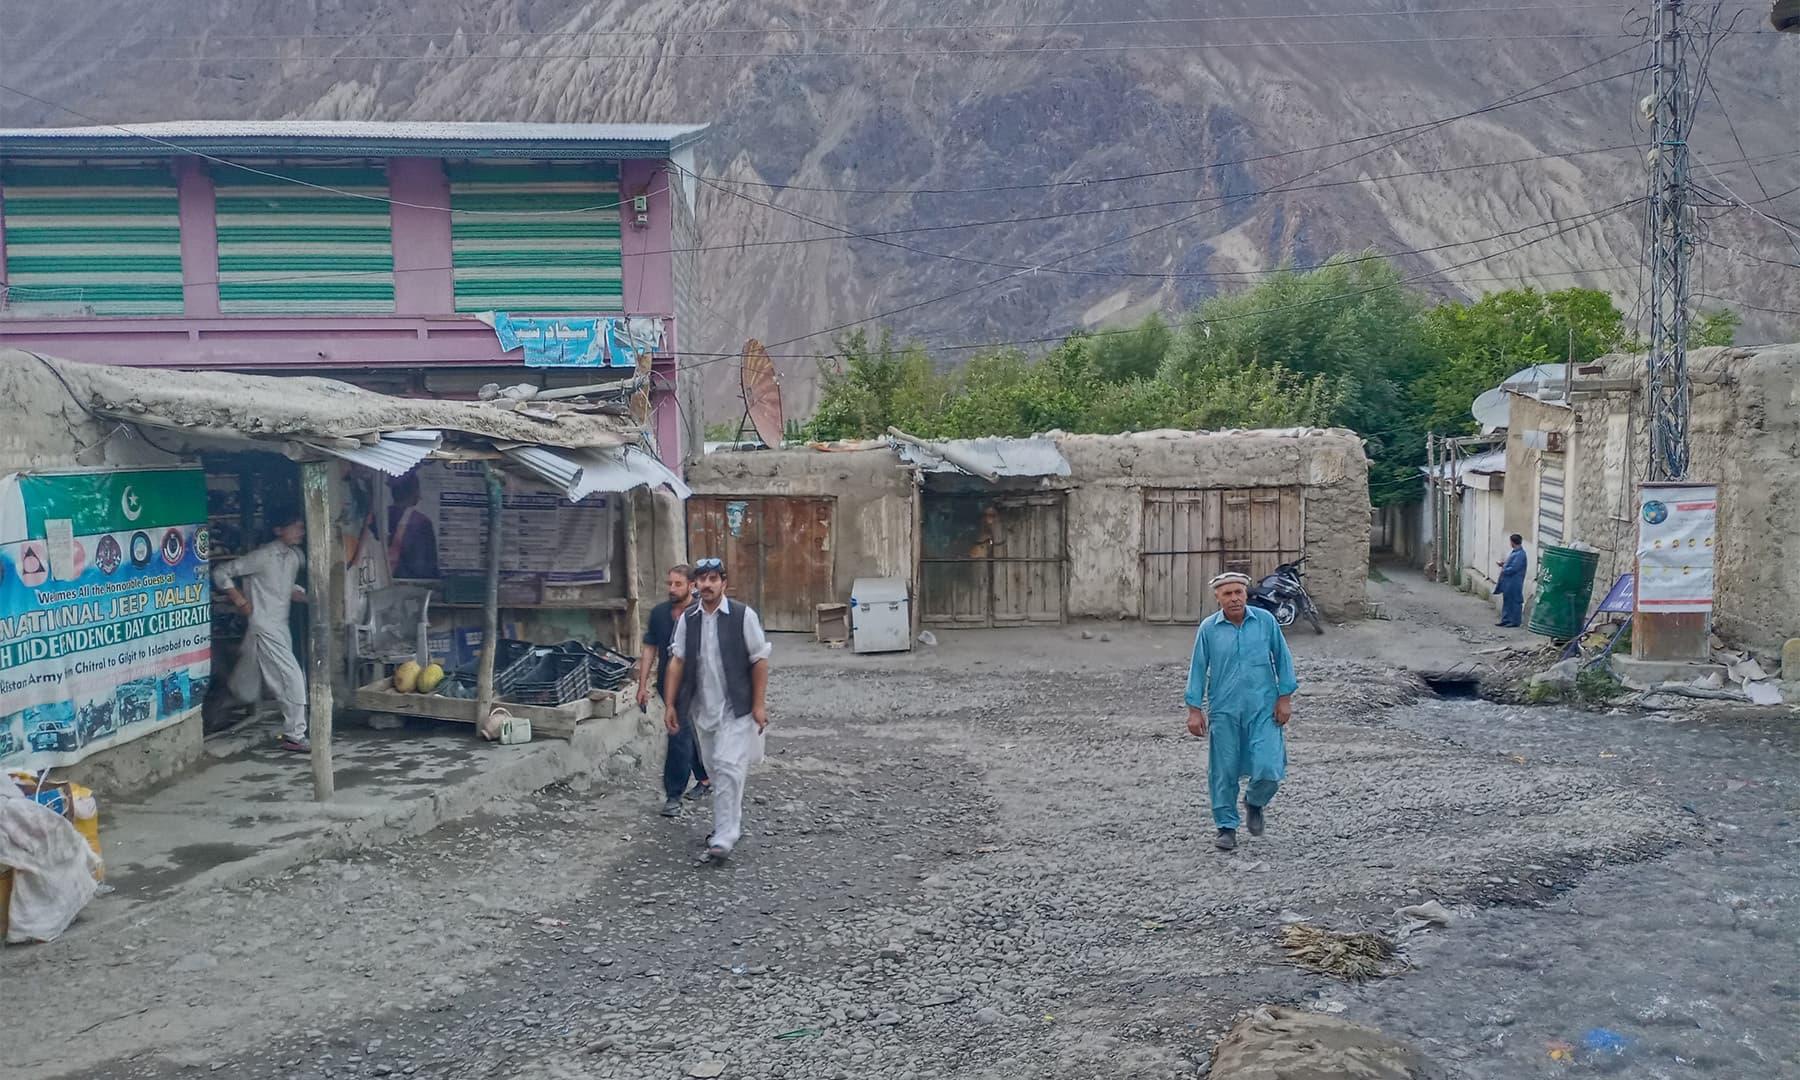 مستوج گاؤں کا بازار